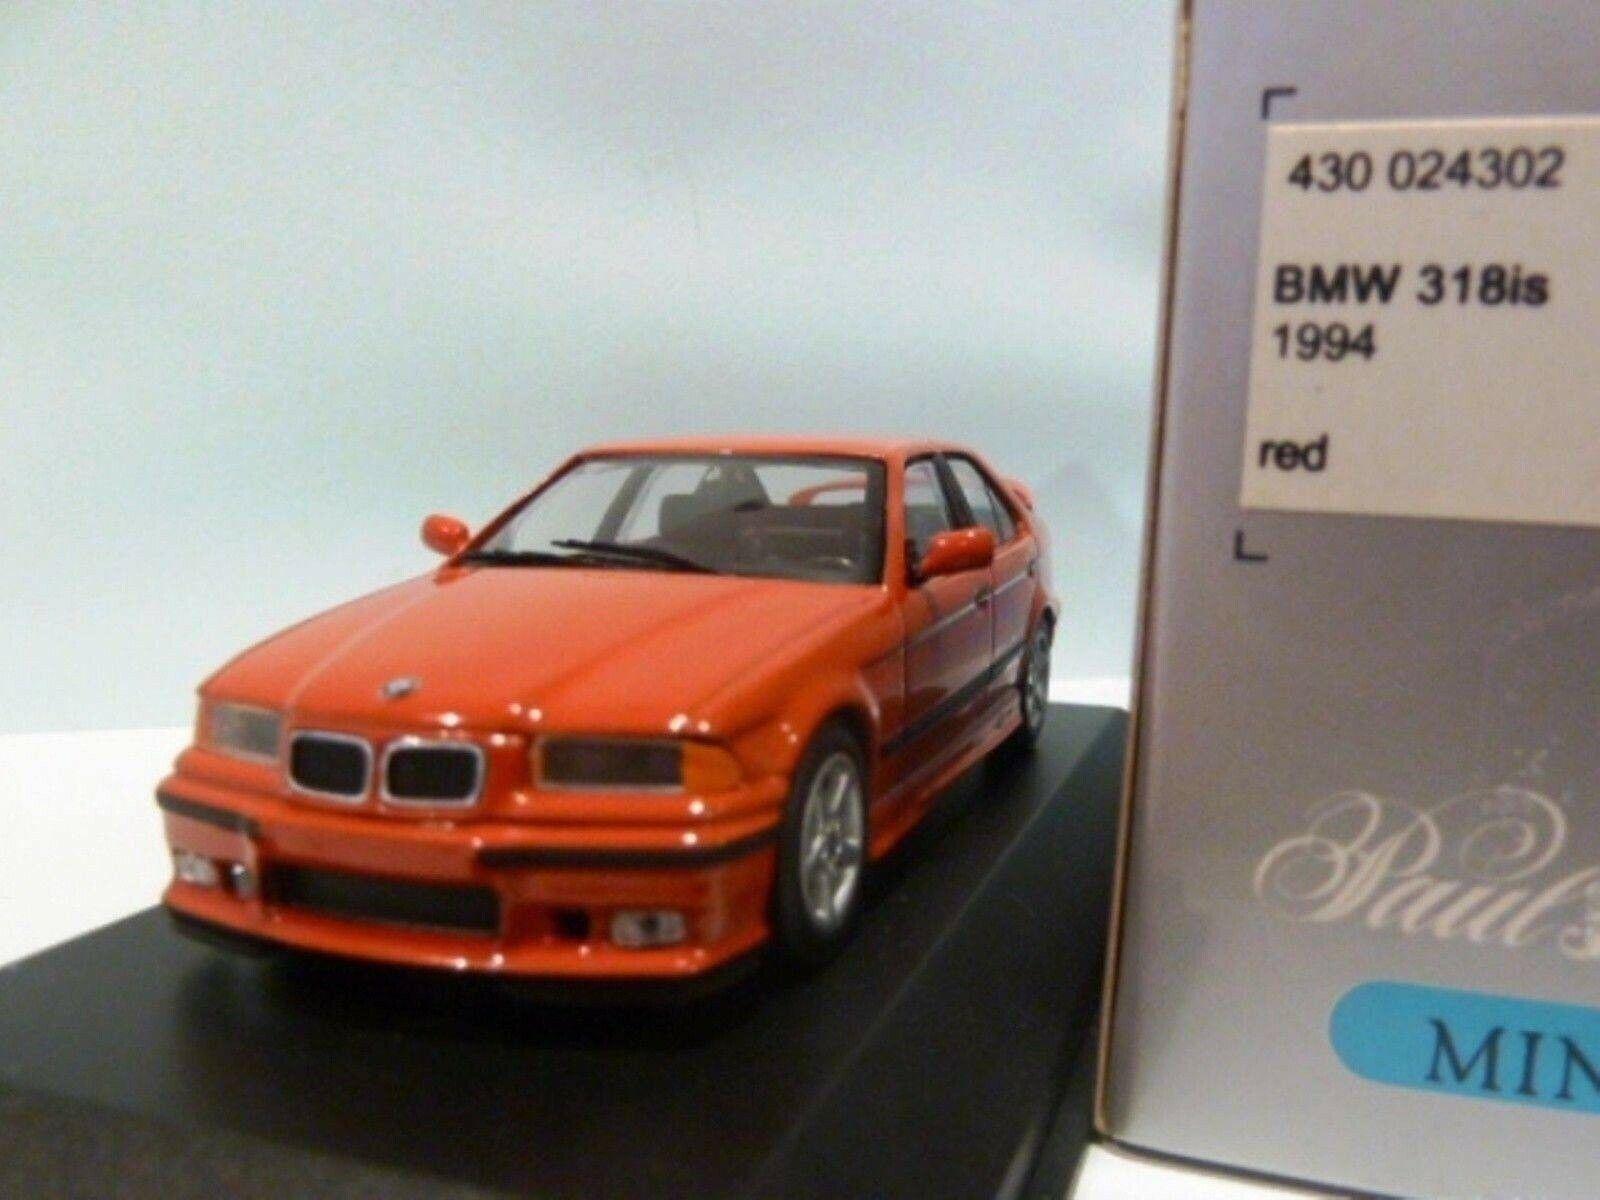 Wow extremadonnate raro BMW E36 1994 318iS rosso 1 43 Minichamps - 635 E21 323 M3 GTR